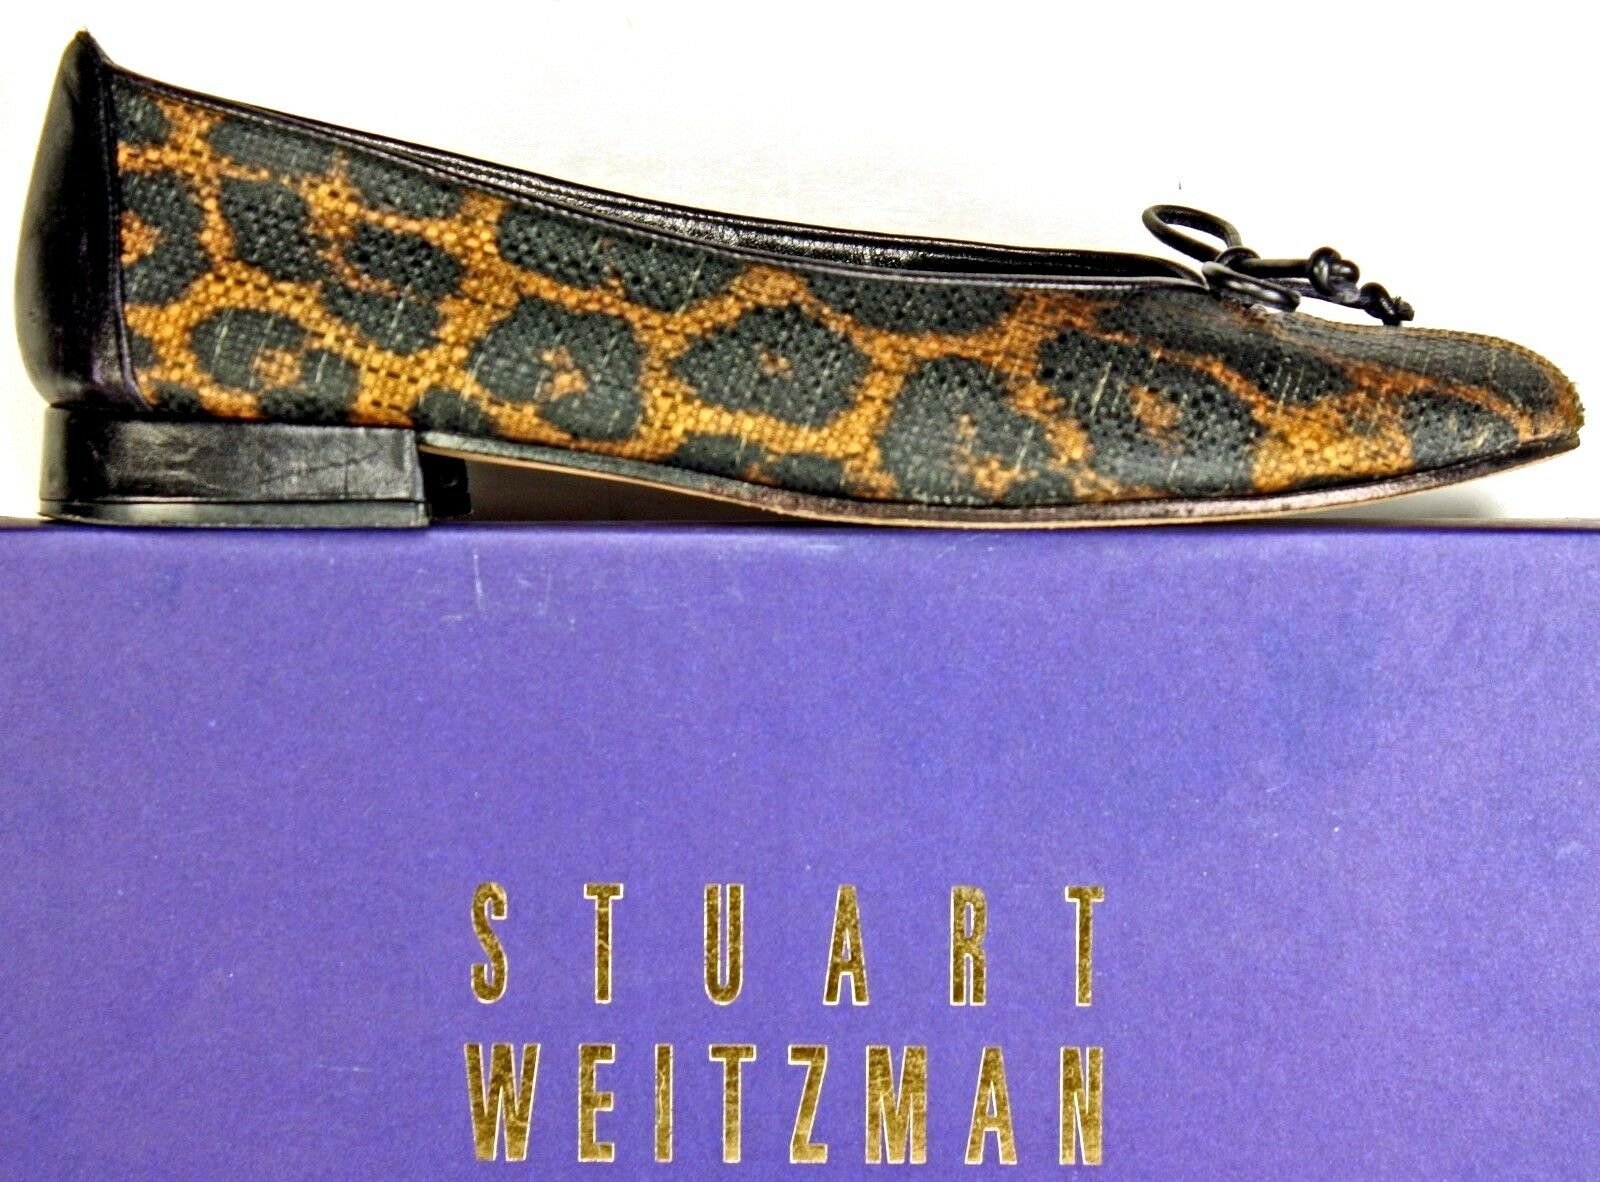 Stuart Weitzman Ballet Flats Größe 9 N Leopard Crosshatched Crosshatched Crosshatched Stitching Schuhes WH30 9e7842